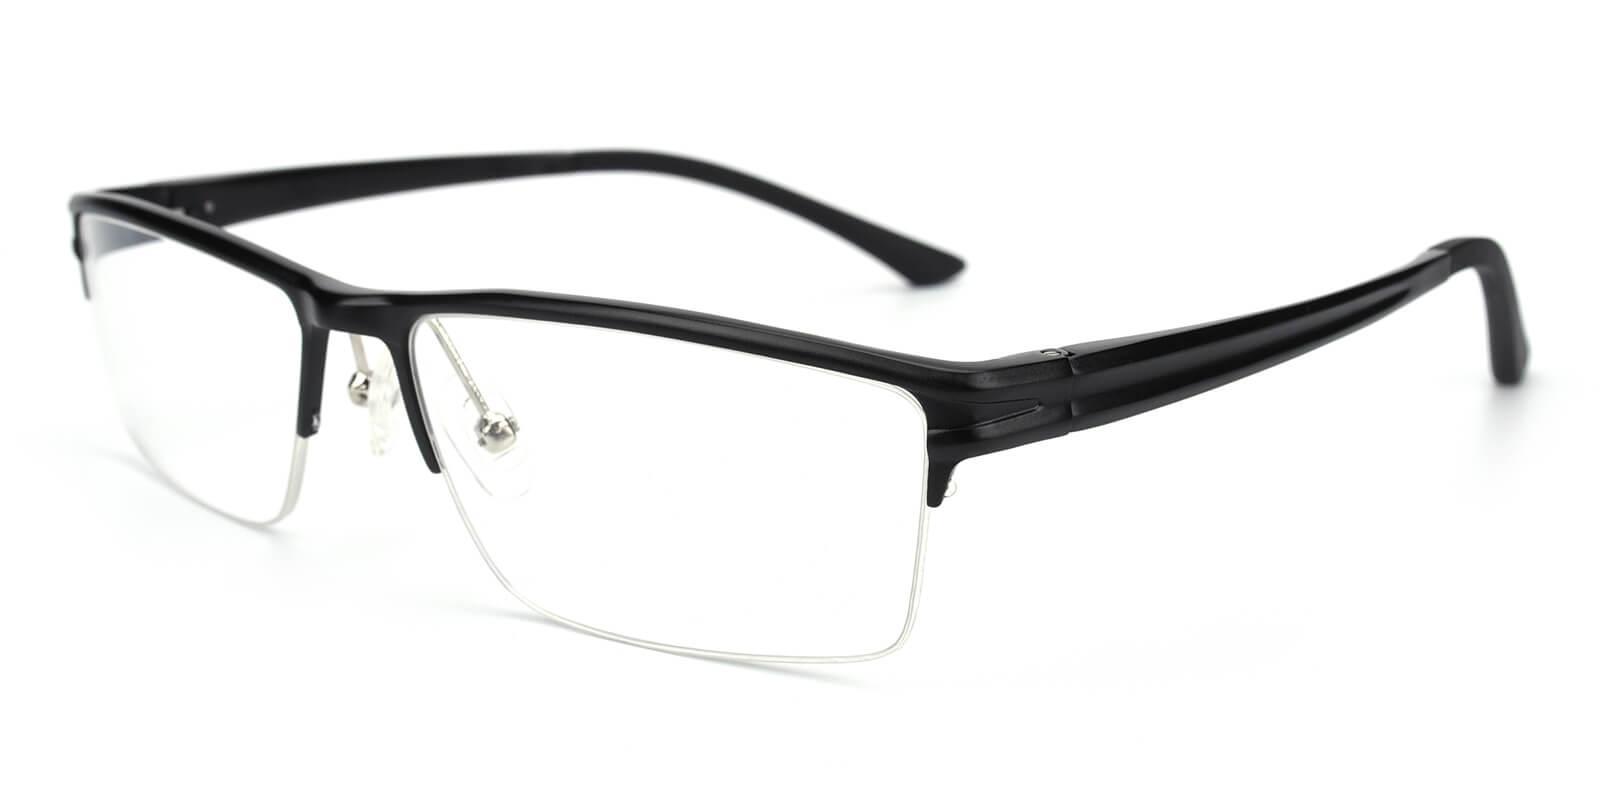 leonado-Black-Rectangle-Metal-Eyeglasses-additional1